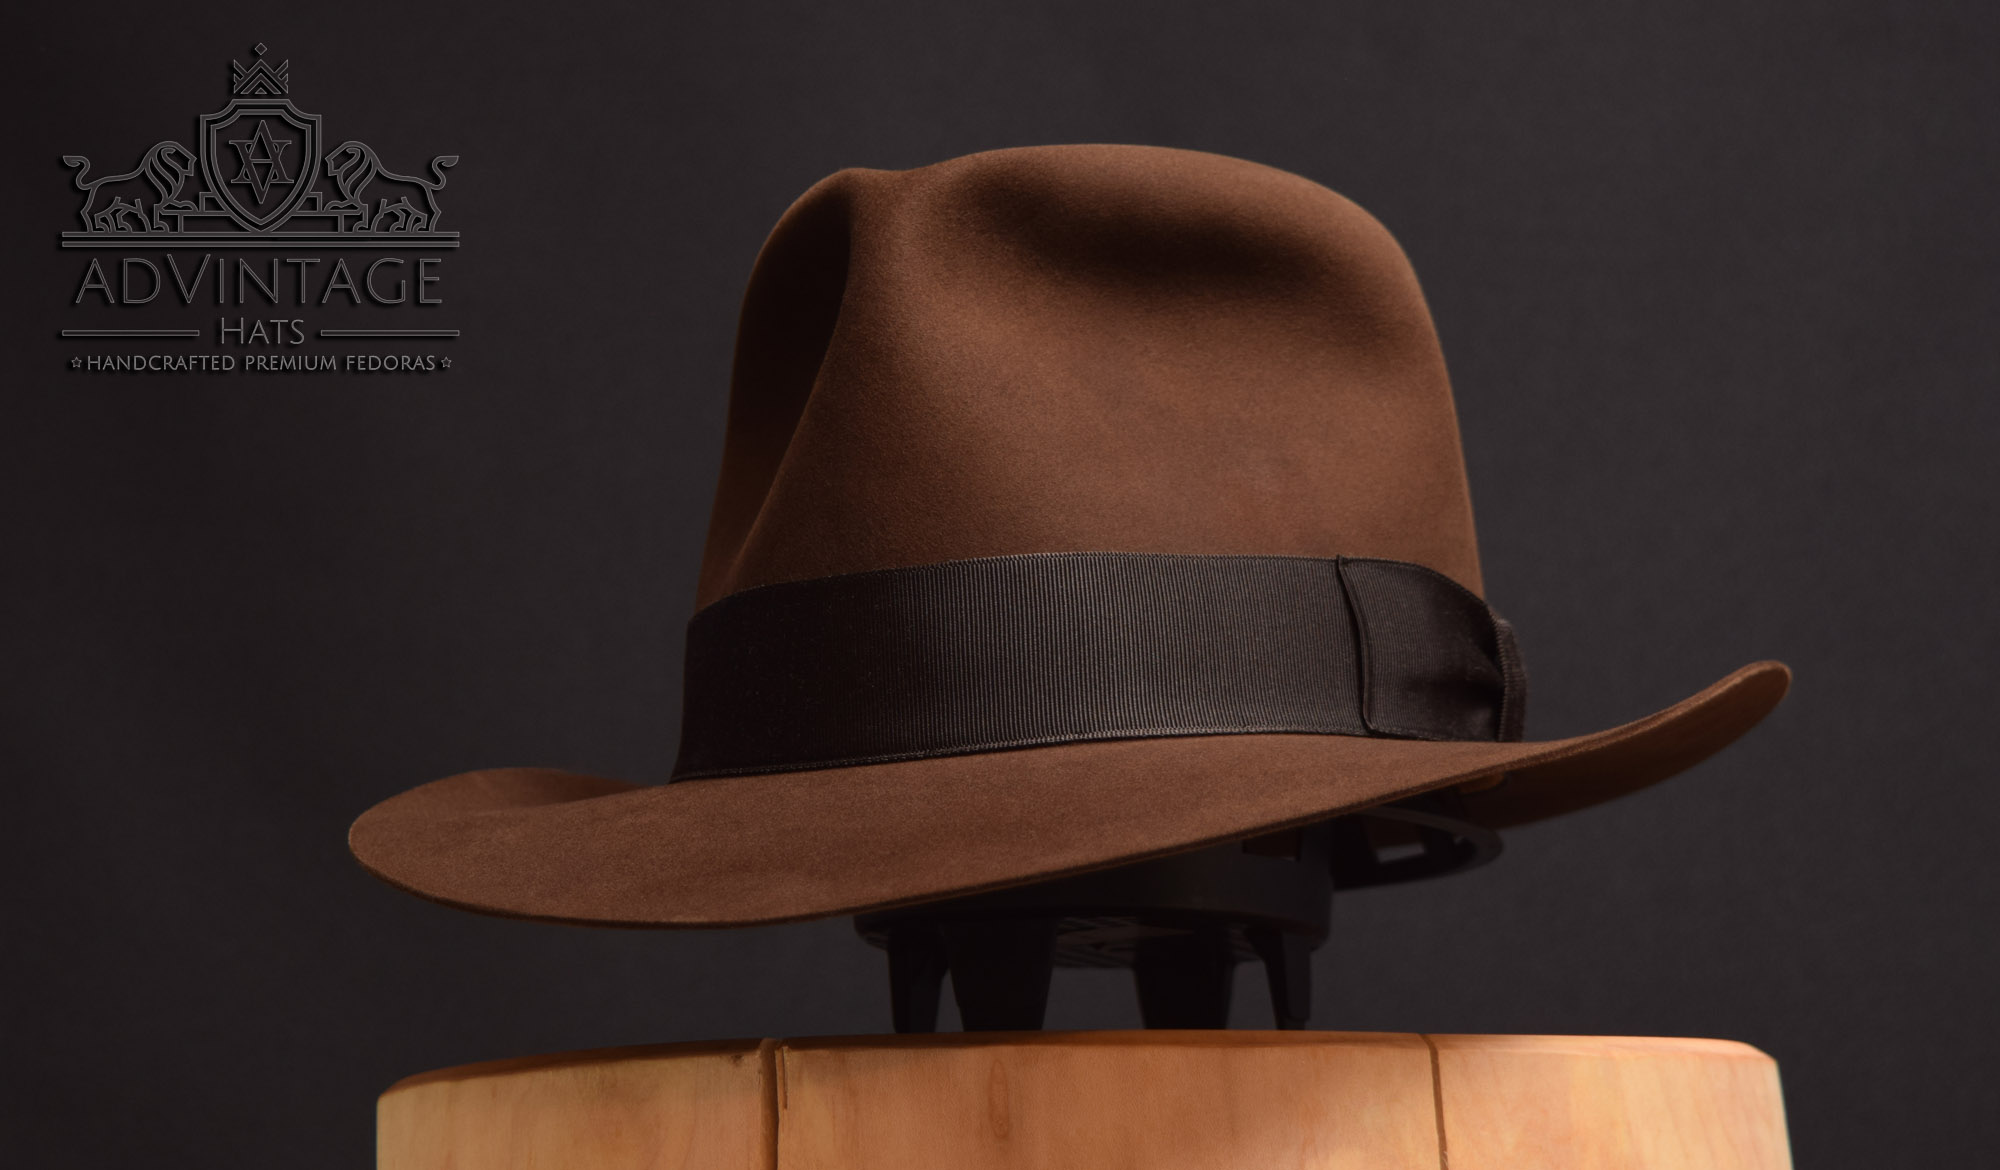 masterpiece advintage crusader fedora hut hat true sable indiana jones indy handmade handgemacht biber beaver felz filz